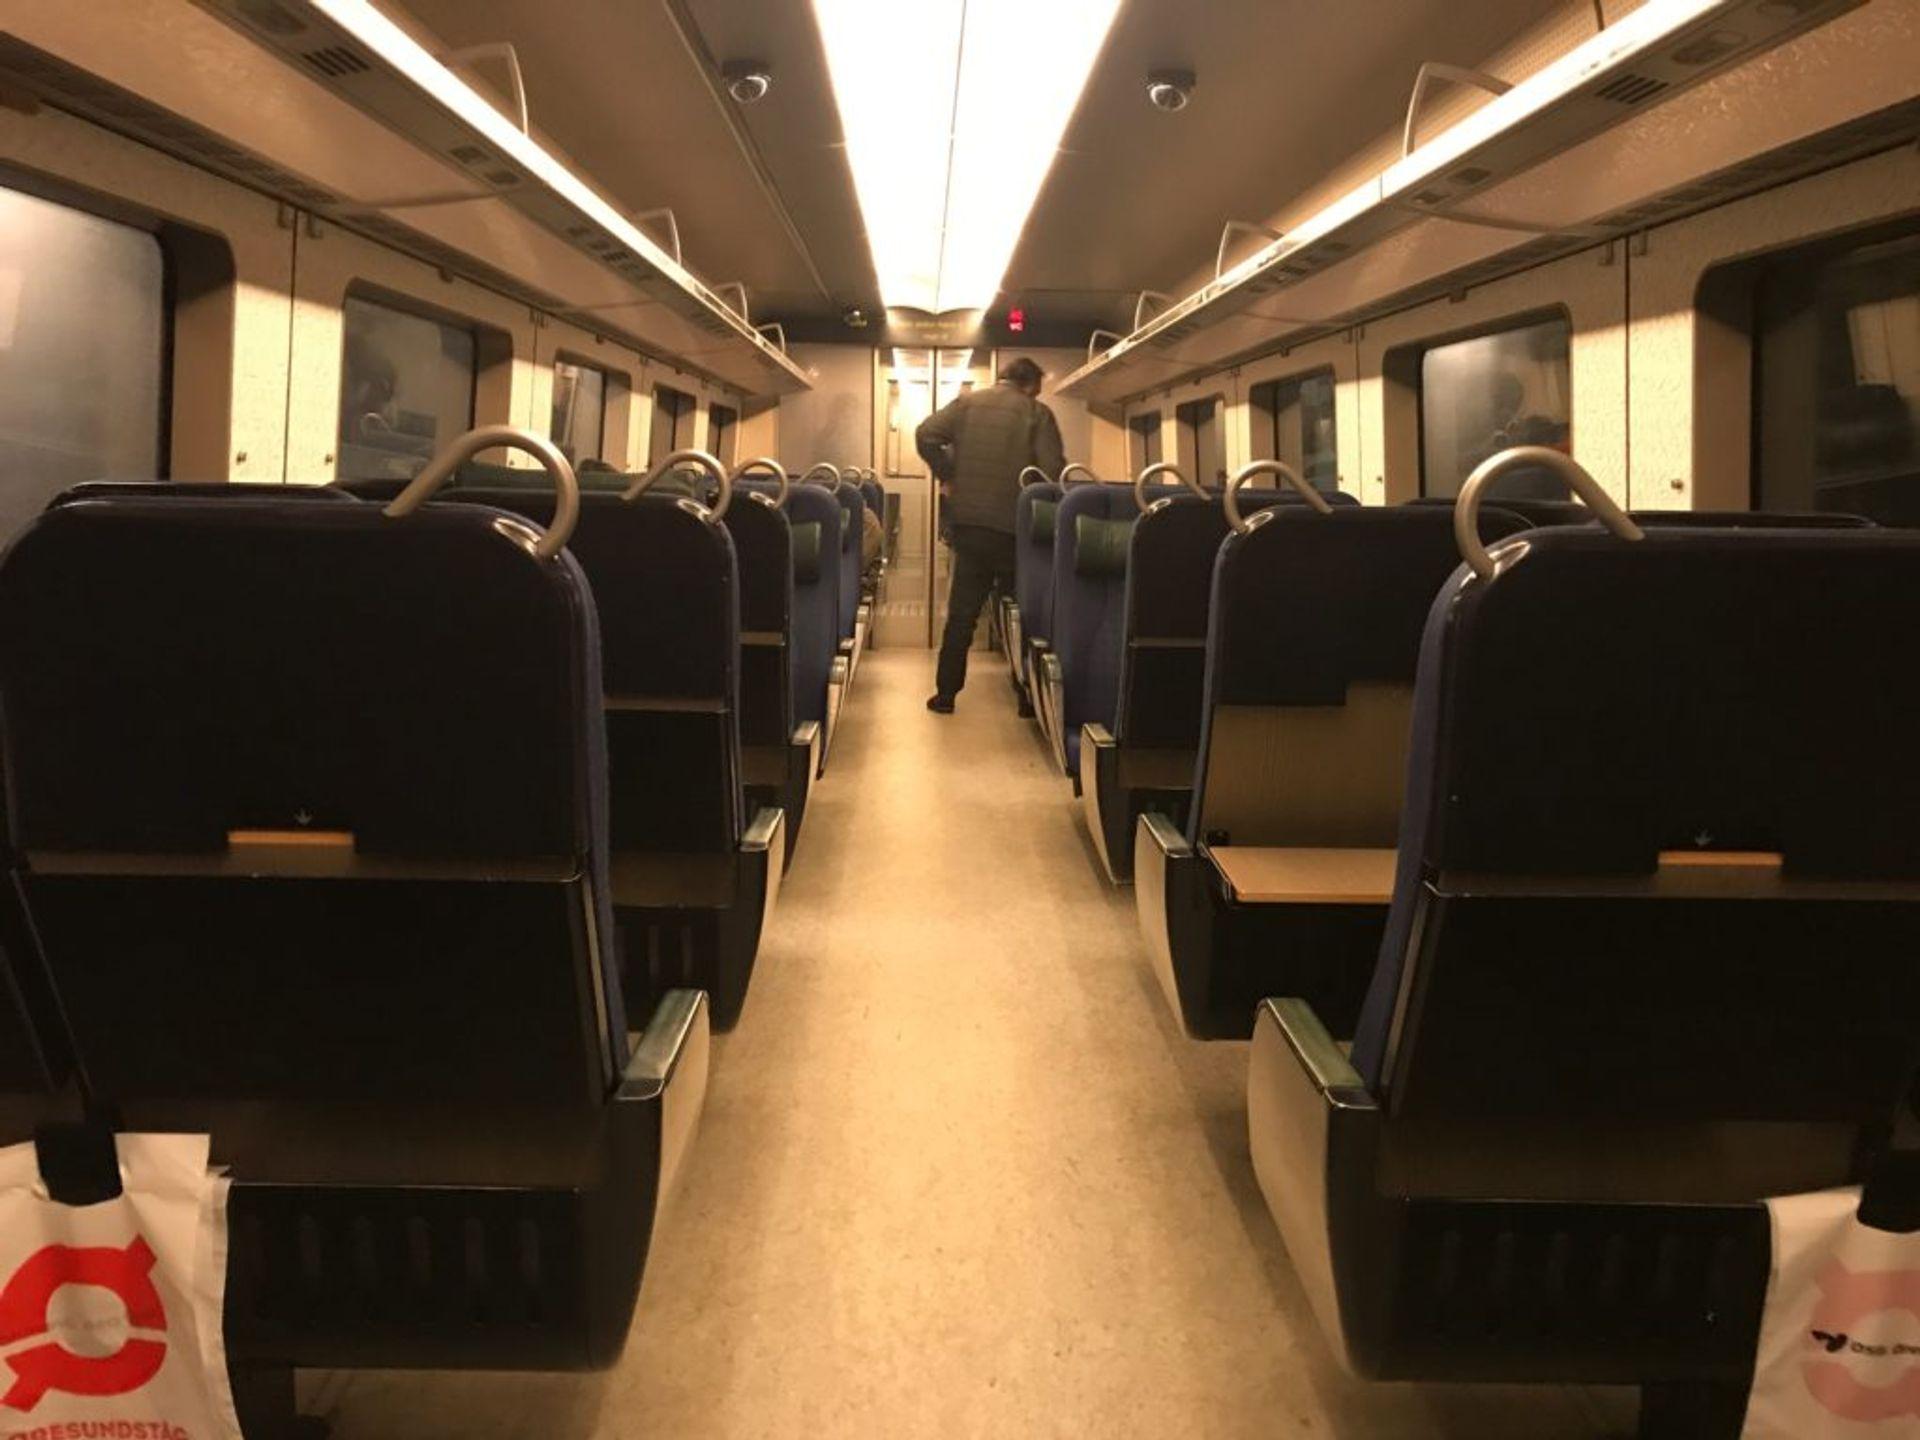 Empty seats on a train.